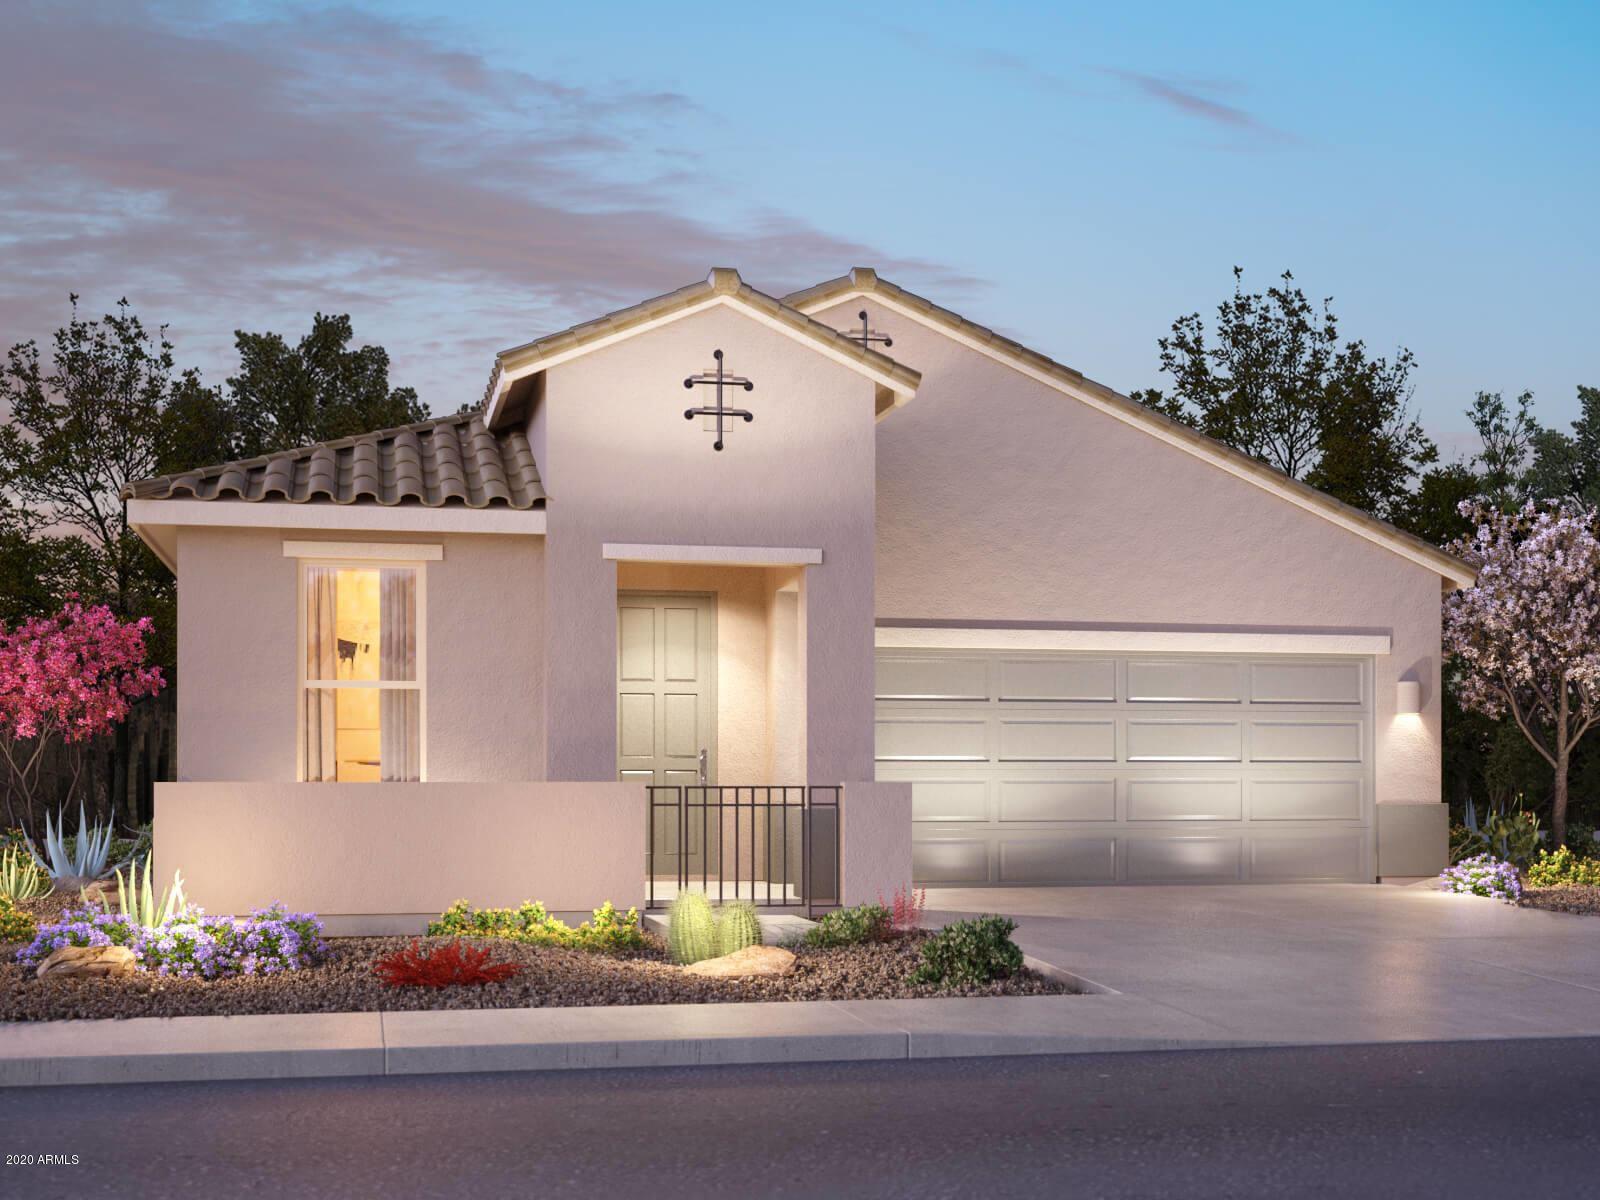 41851 W SAGEBRUSH Court, Maricopa, AZ 85138 - MLS#: 6110416